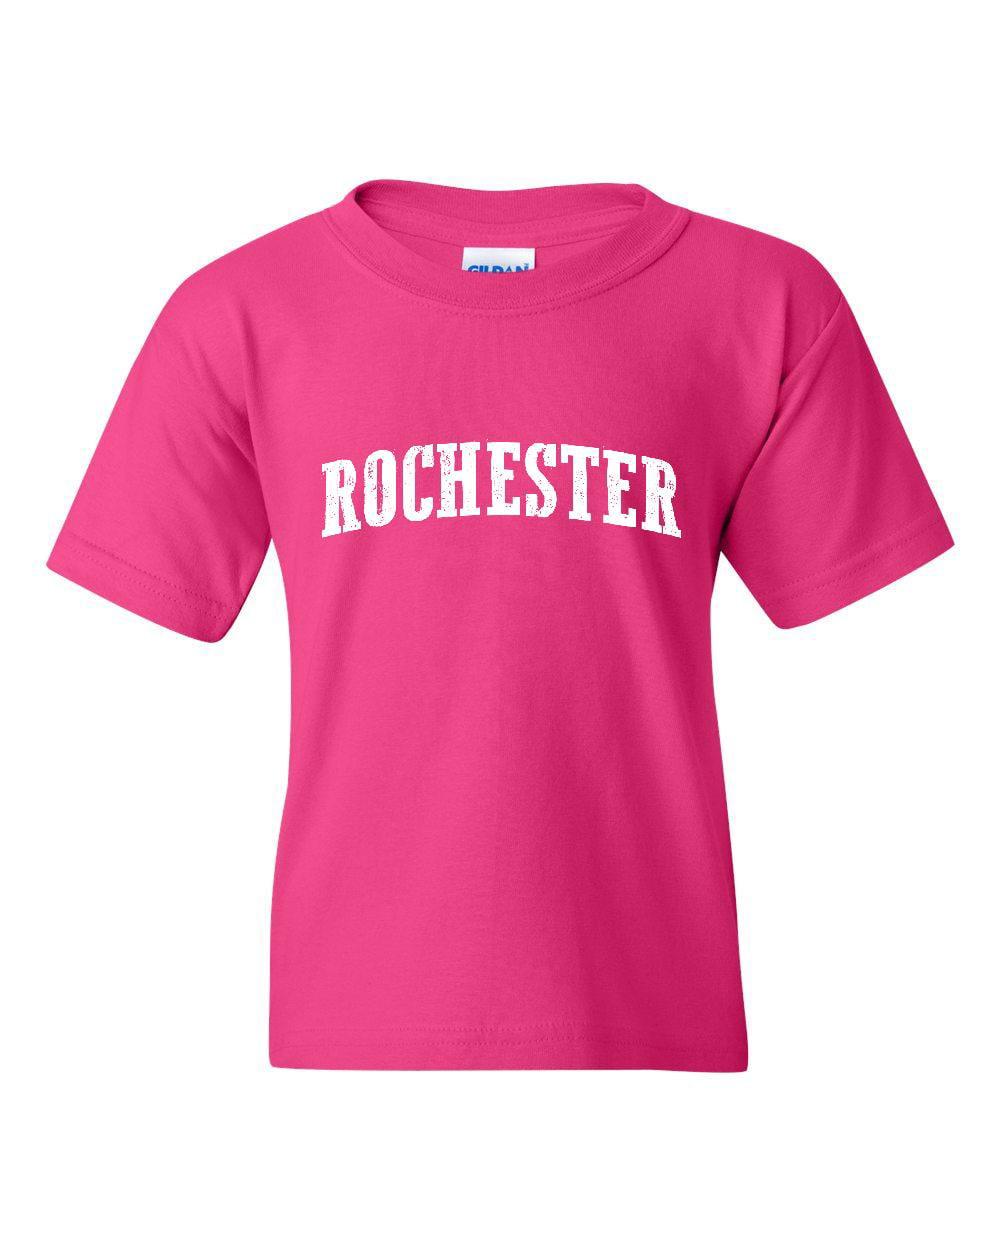 Rochester NY New York City Hotels Map Tickets